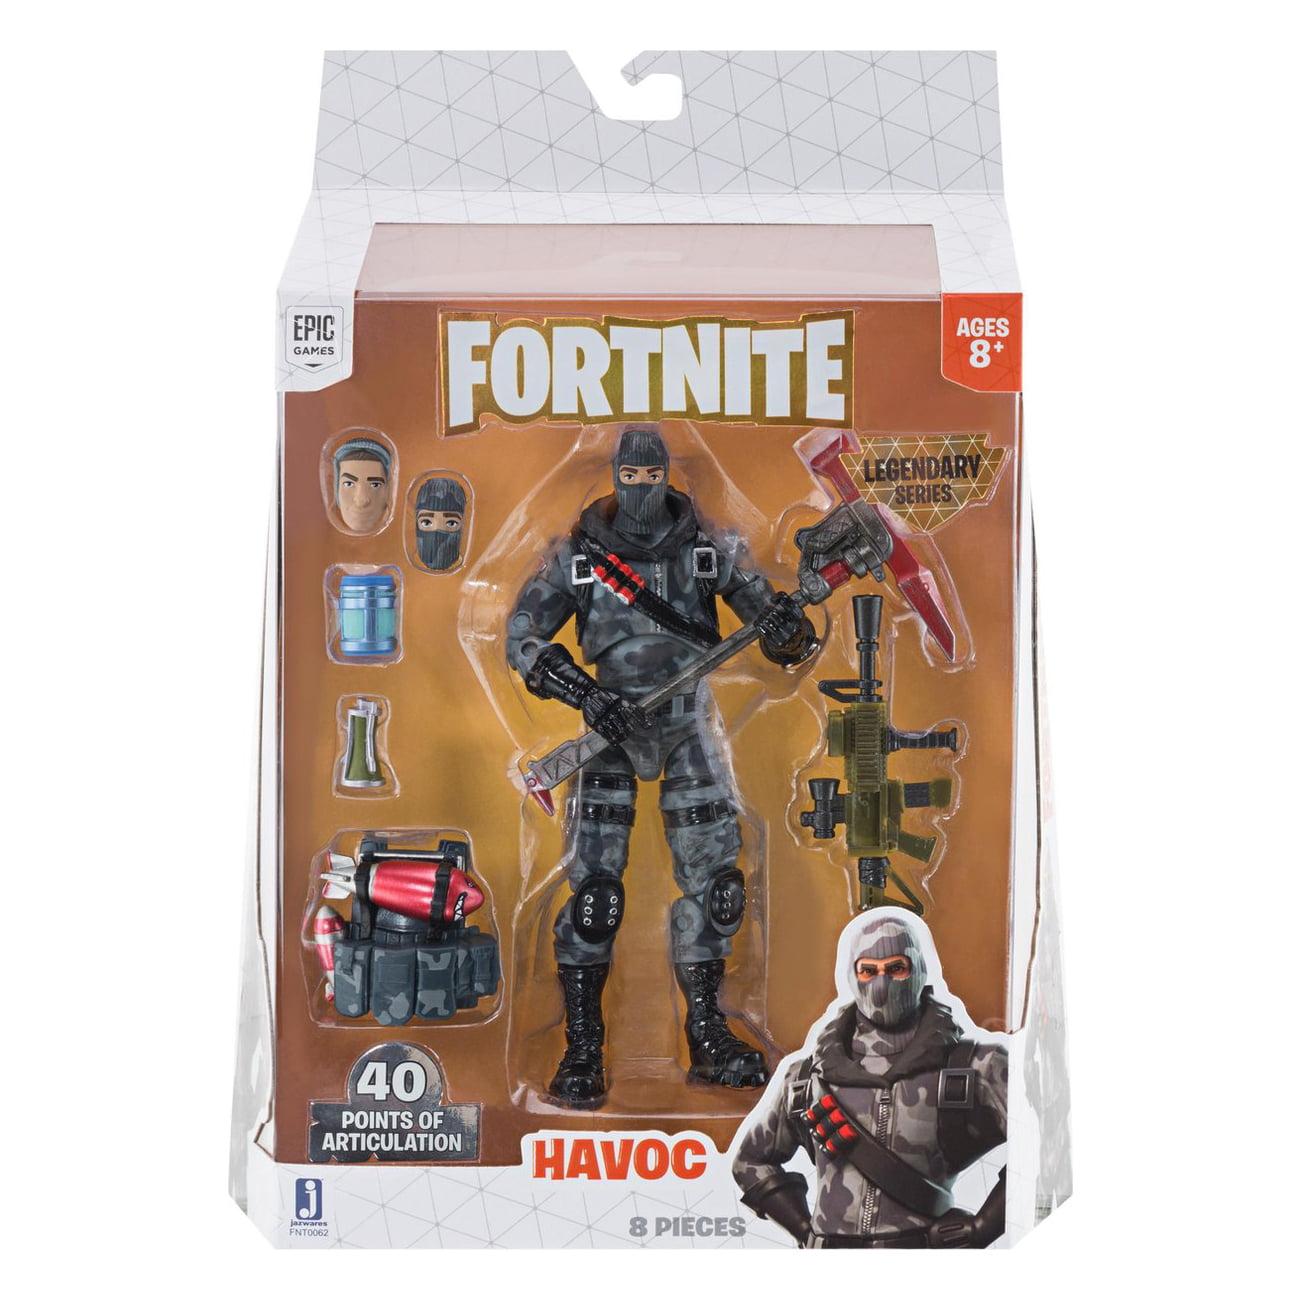 FORTNITE - HAVOC- ACTION FIGURE - 15 CM